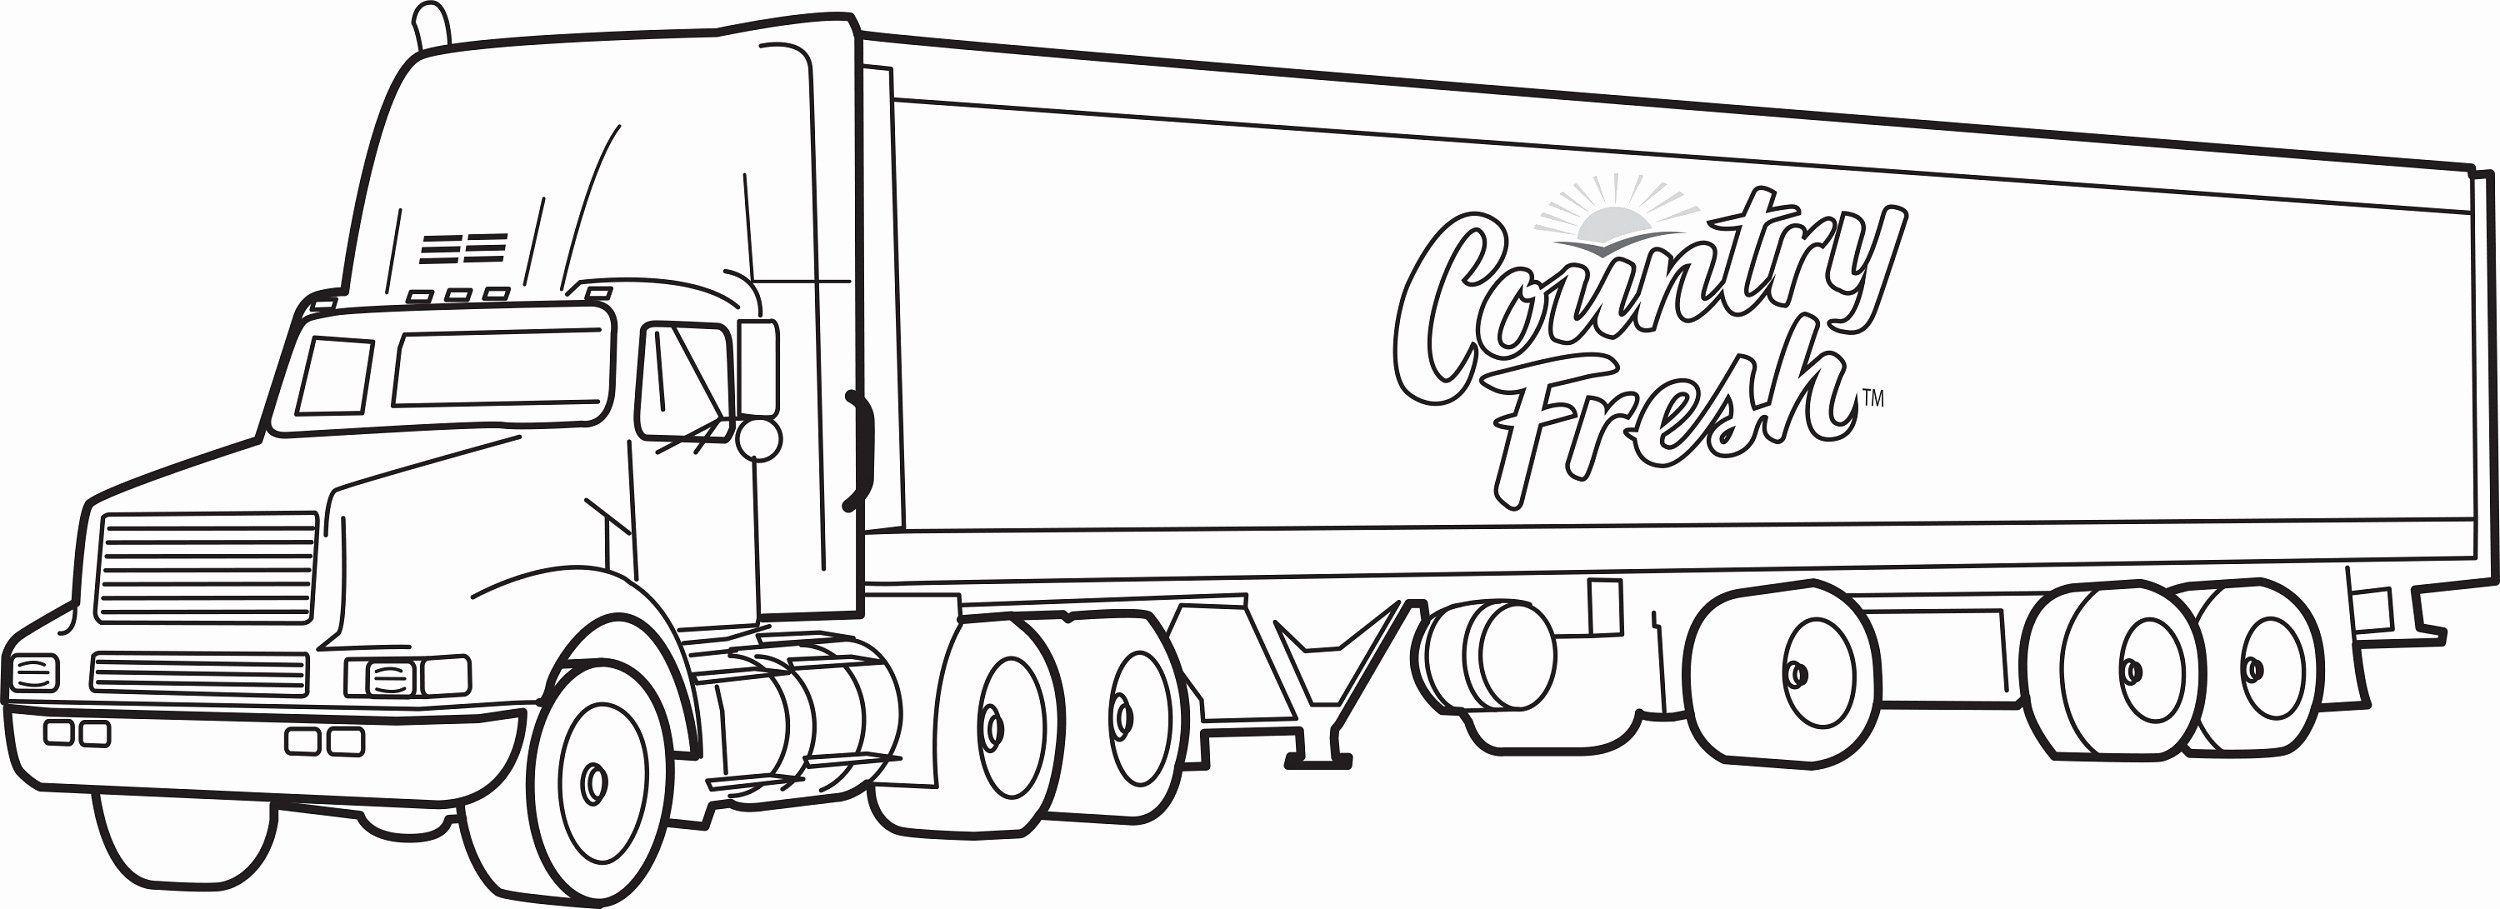 Semi Truck Coloring Pages Truck Coloring Pages Monster Truck